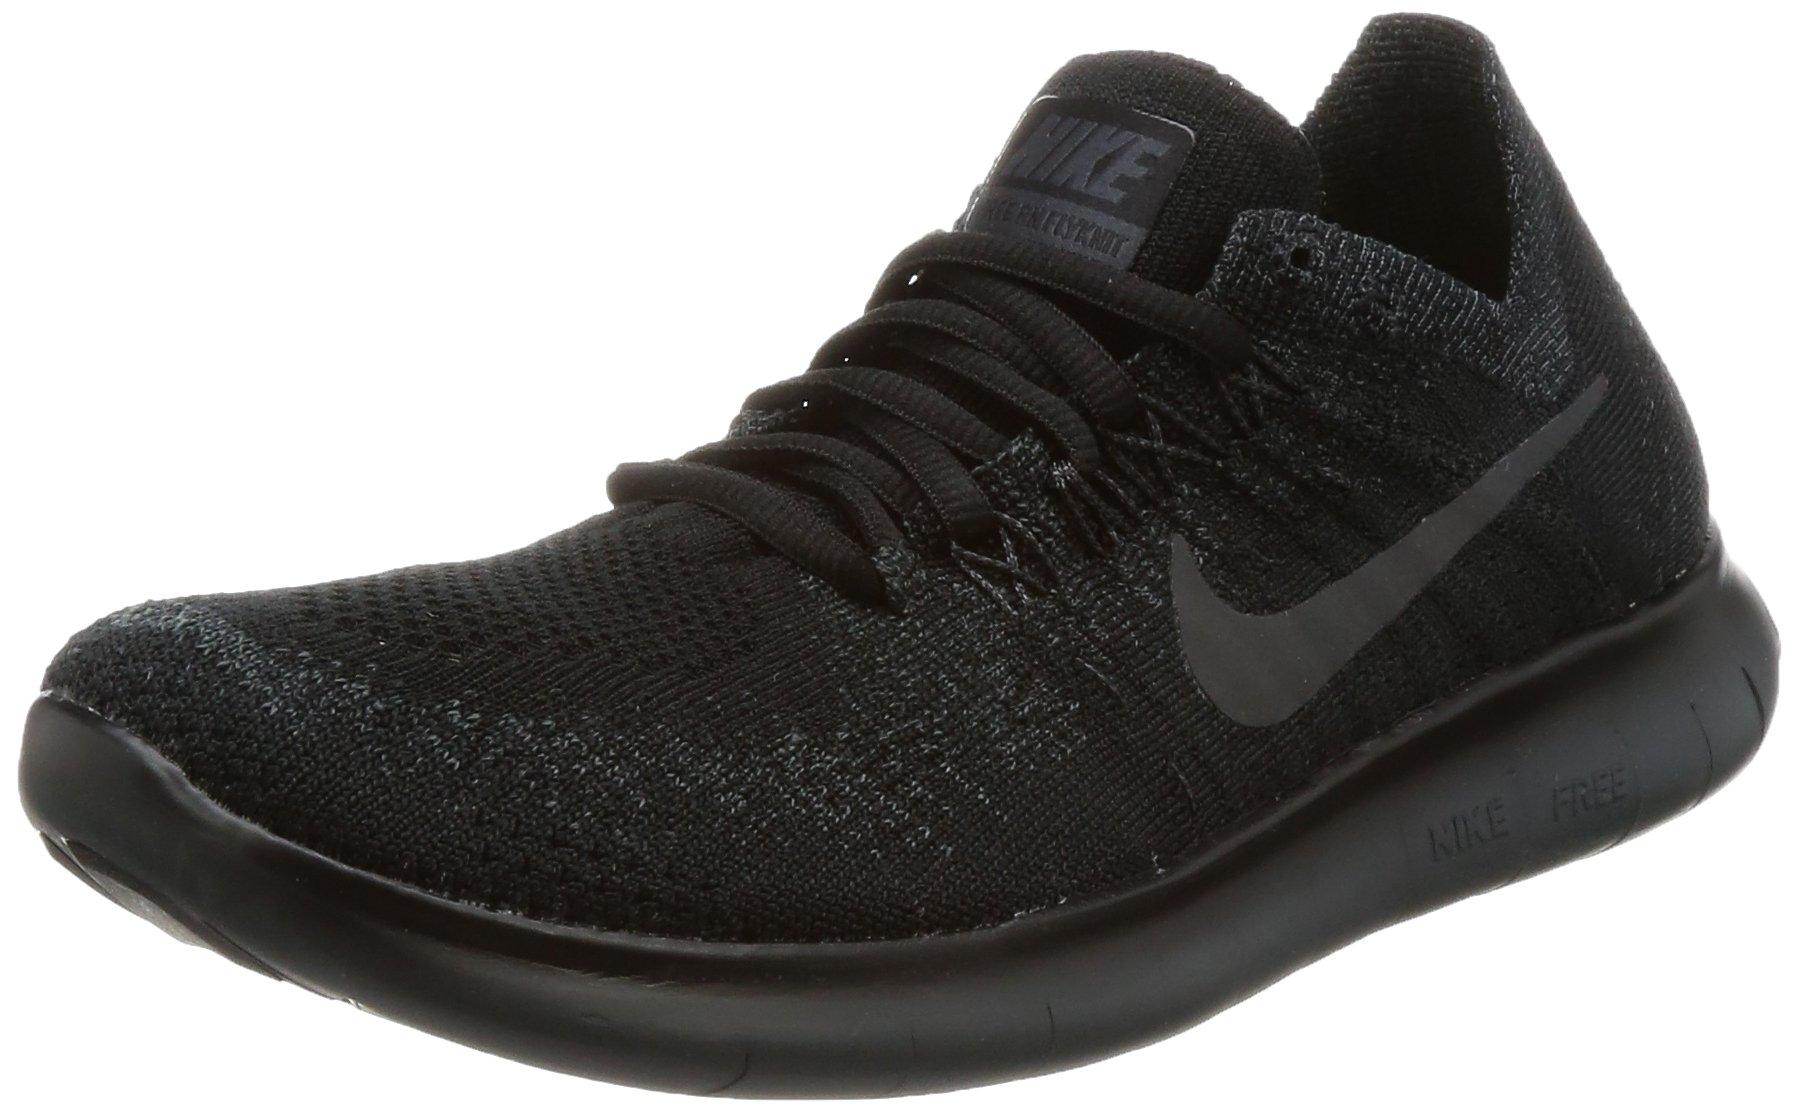 Nike Women's Free RN Flyknit 2017 Running Shoe BlackAnthracite Anthracite 7.5